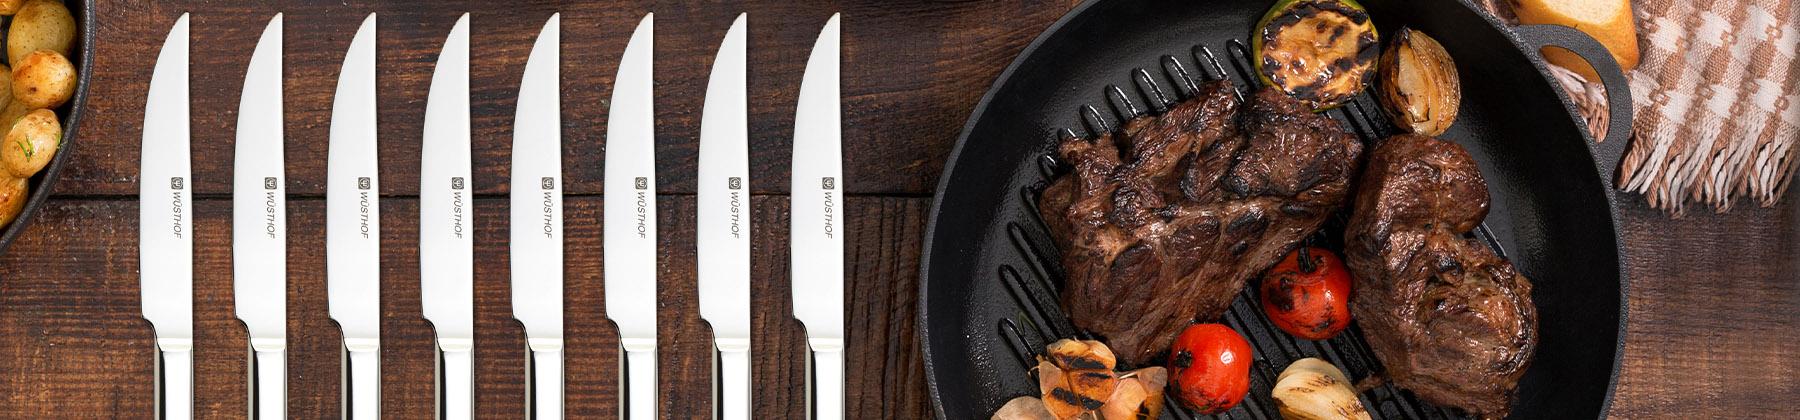 Photo of steak knives.